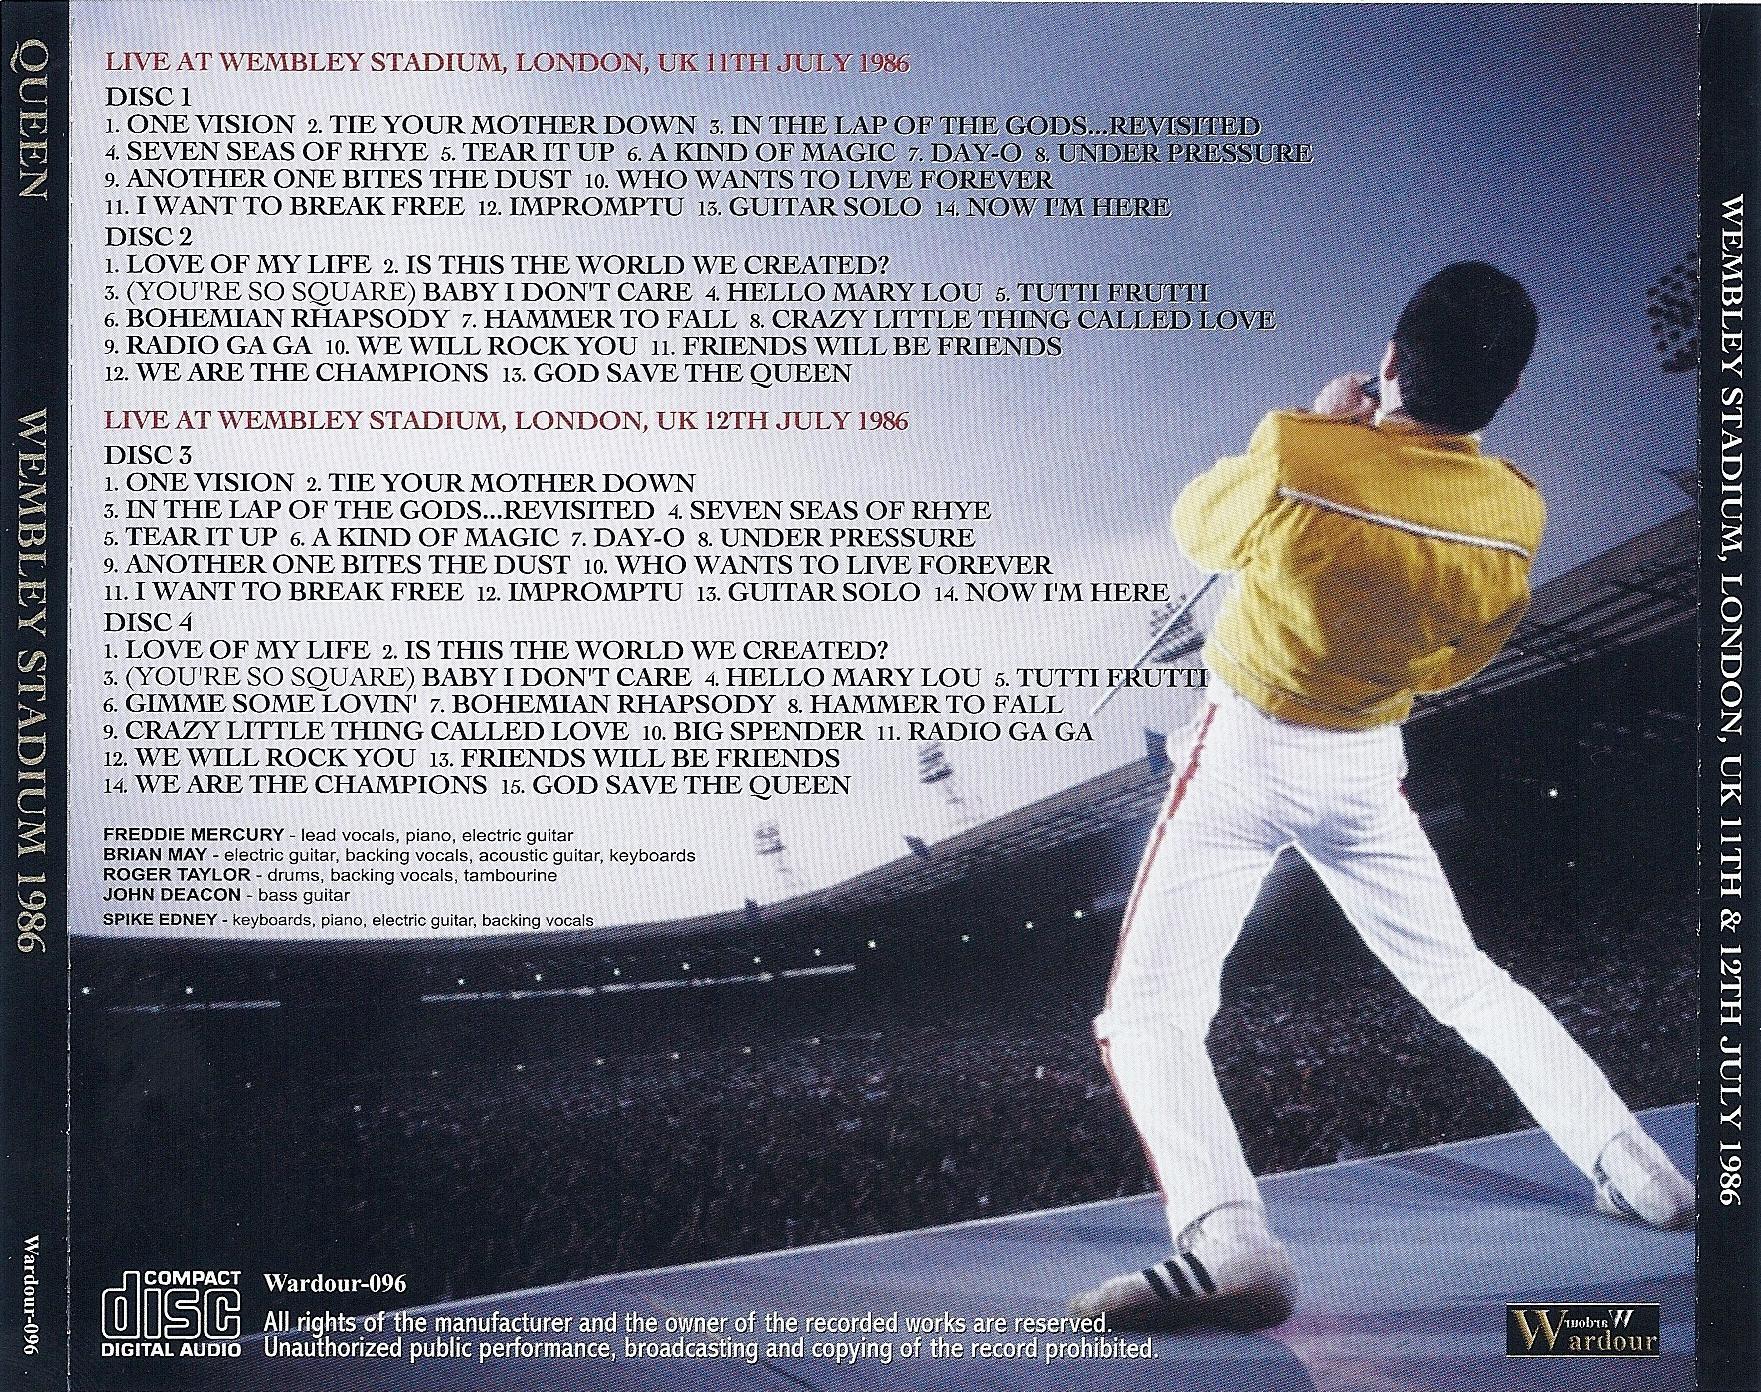 Track listing: